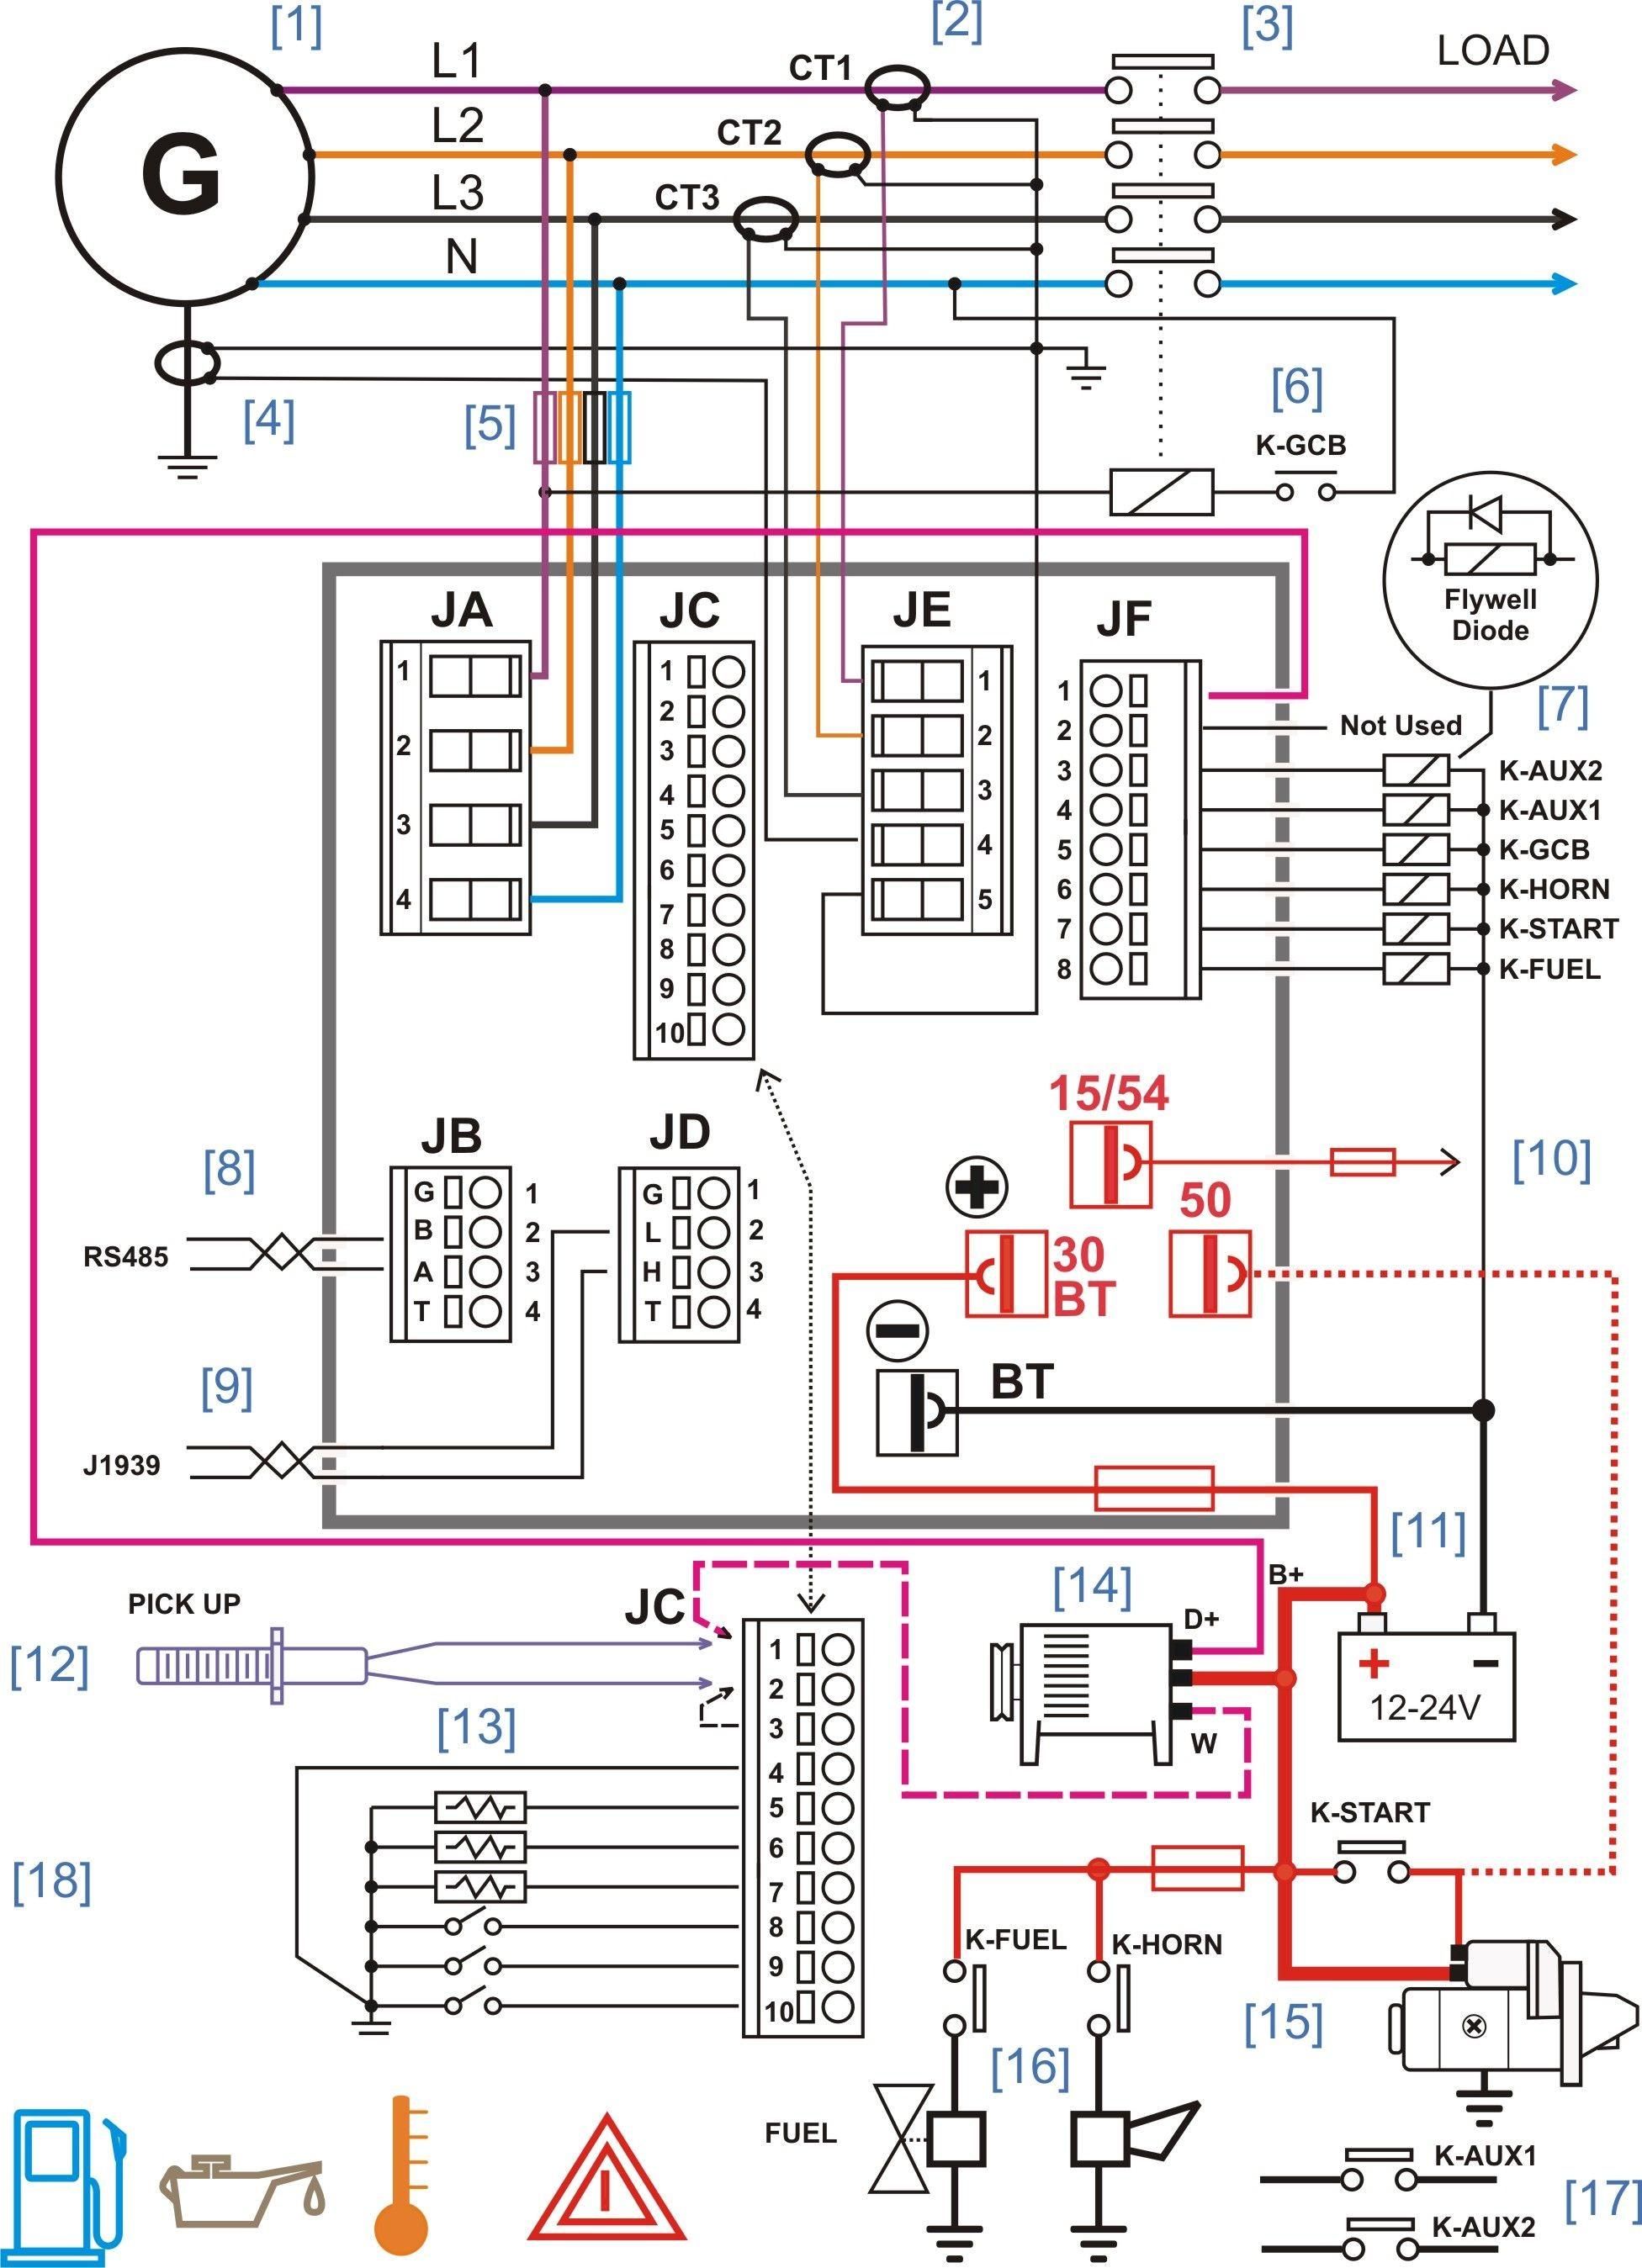 Gas Engine Diagram Diesel Generator Control Panel Wiring Diagram Of Gas Engine Diagram